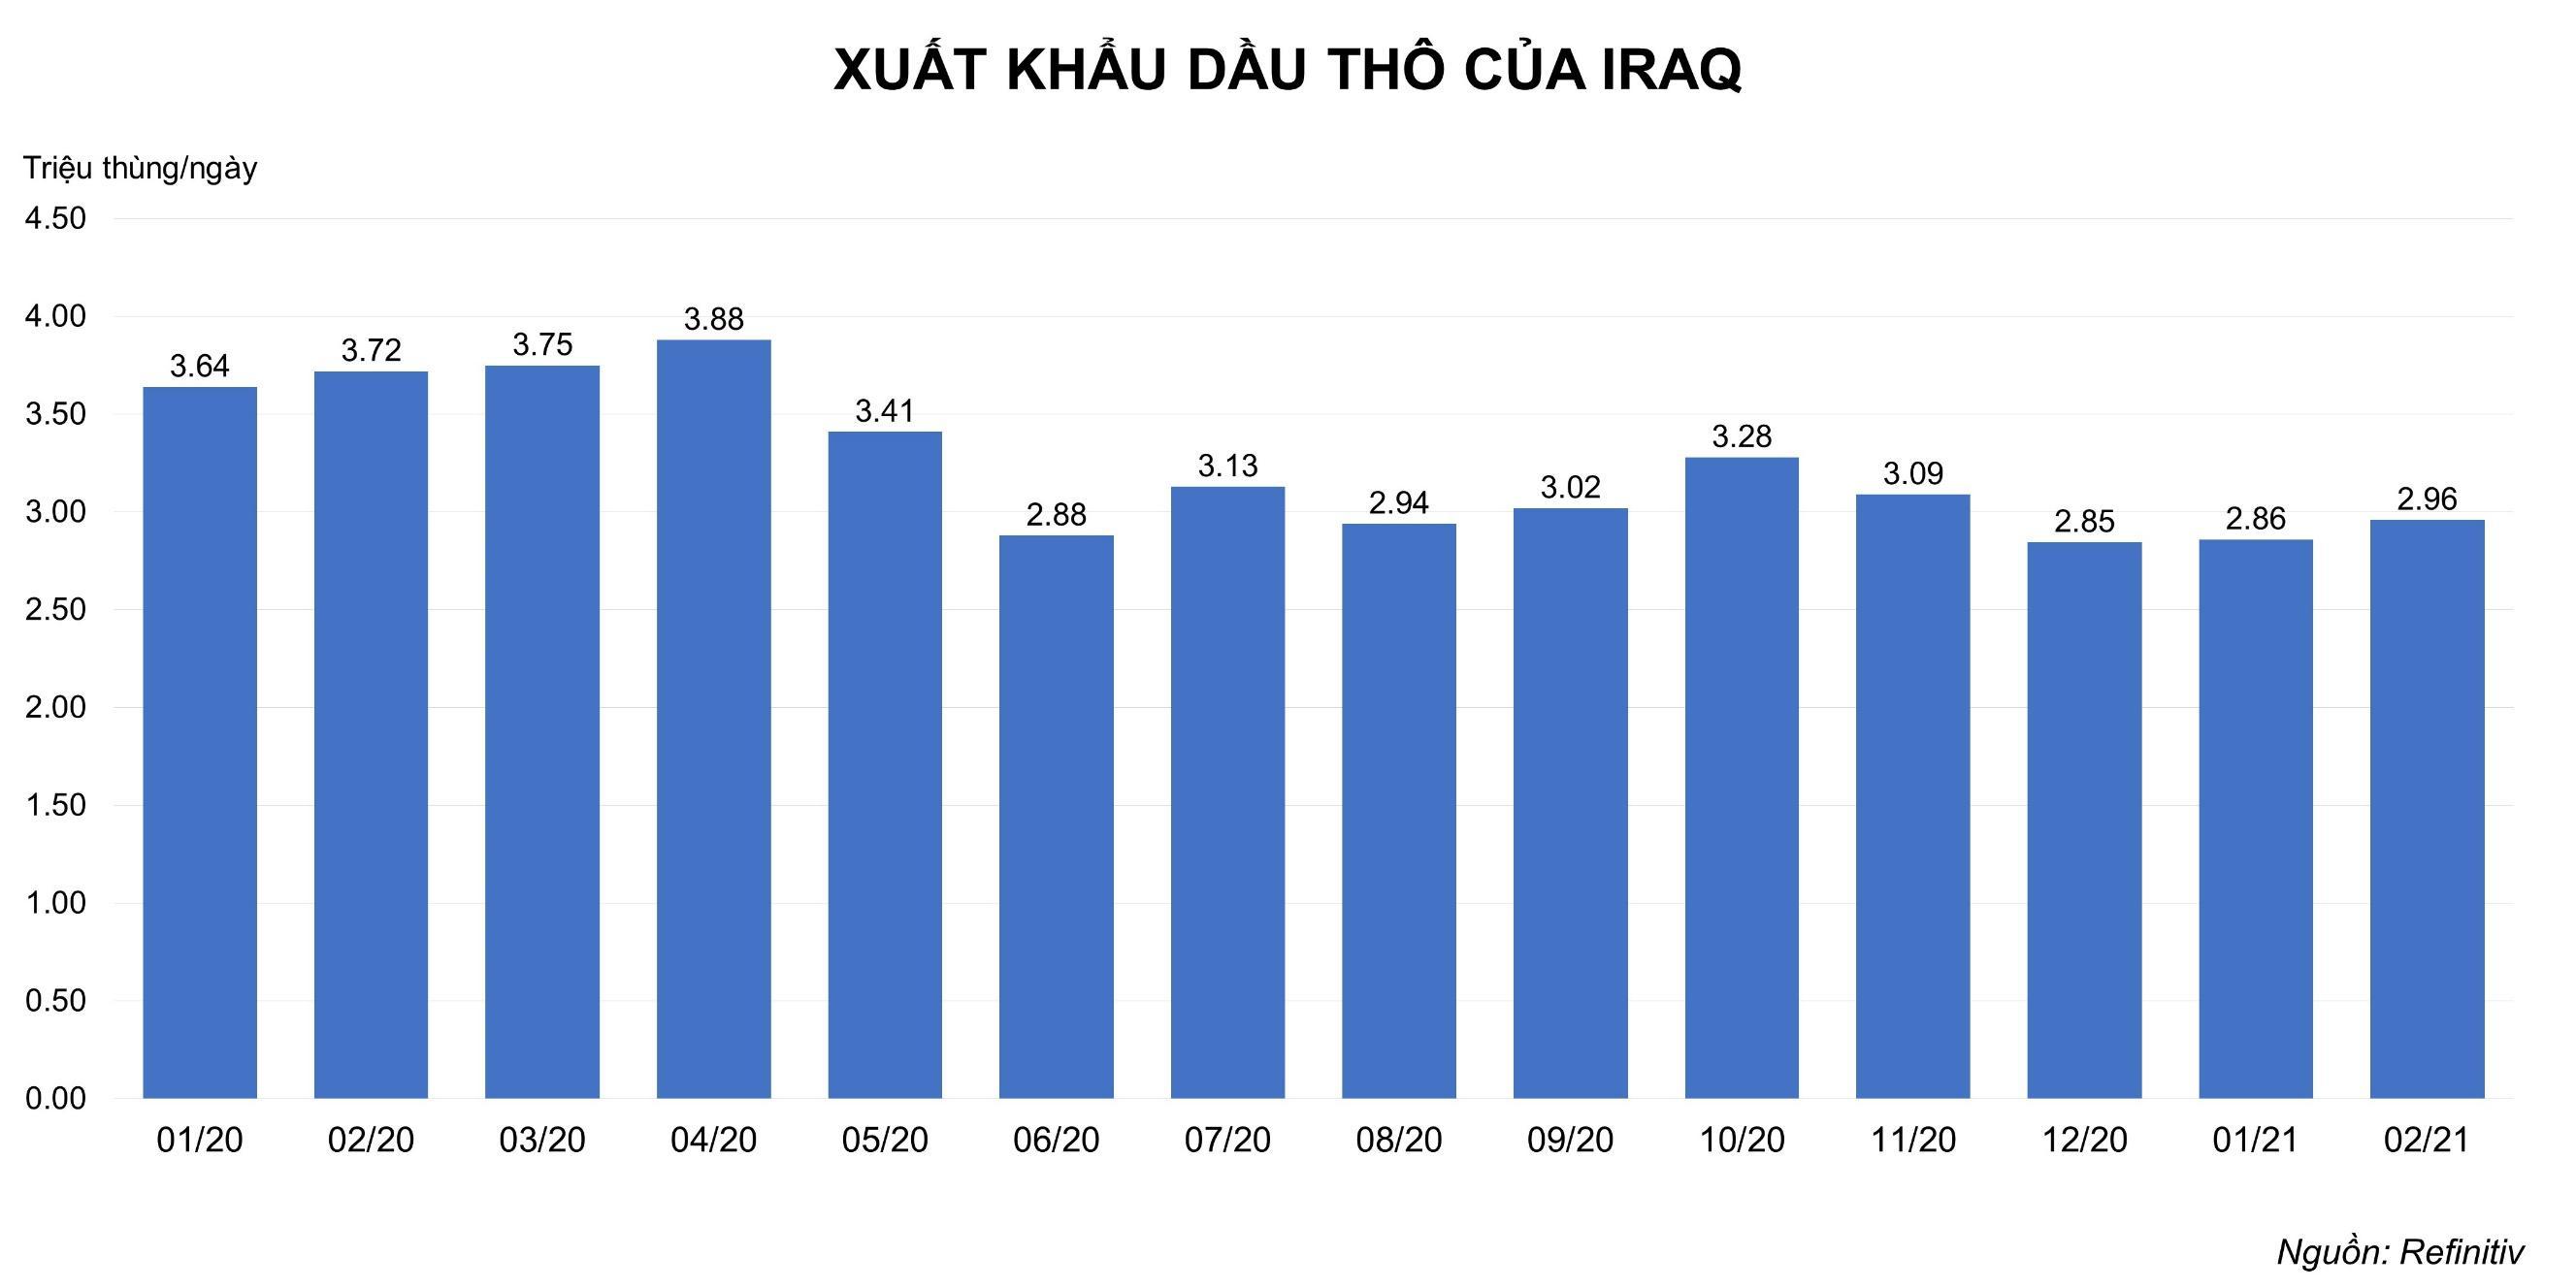 Chart, bar chartDescription automatically generated